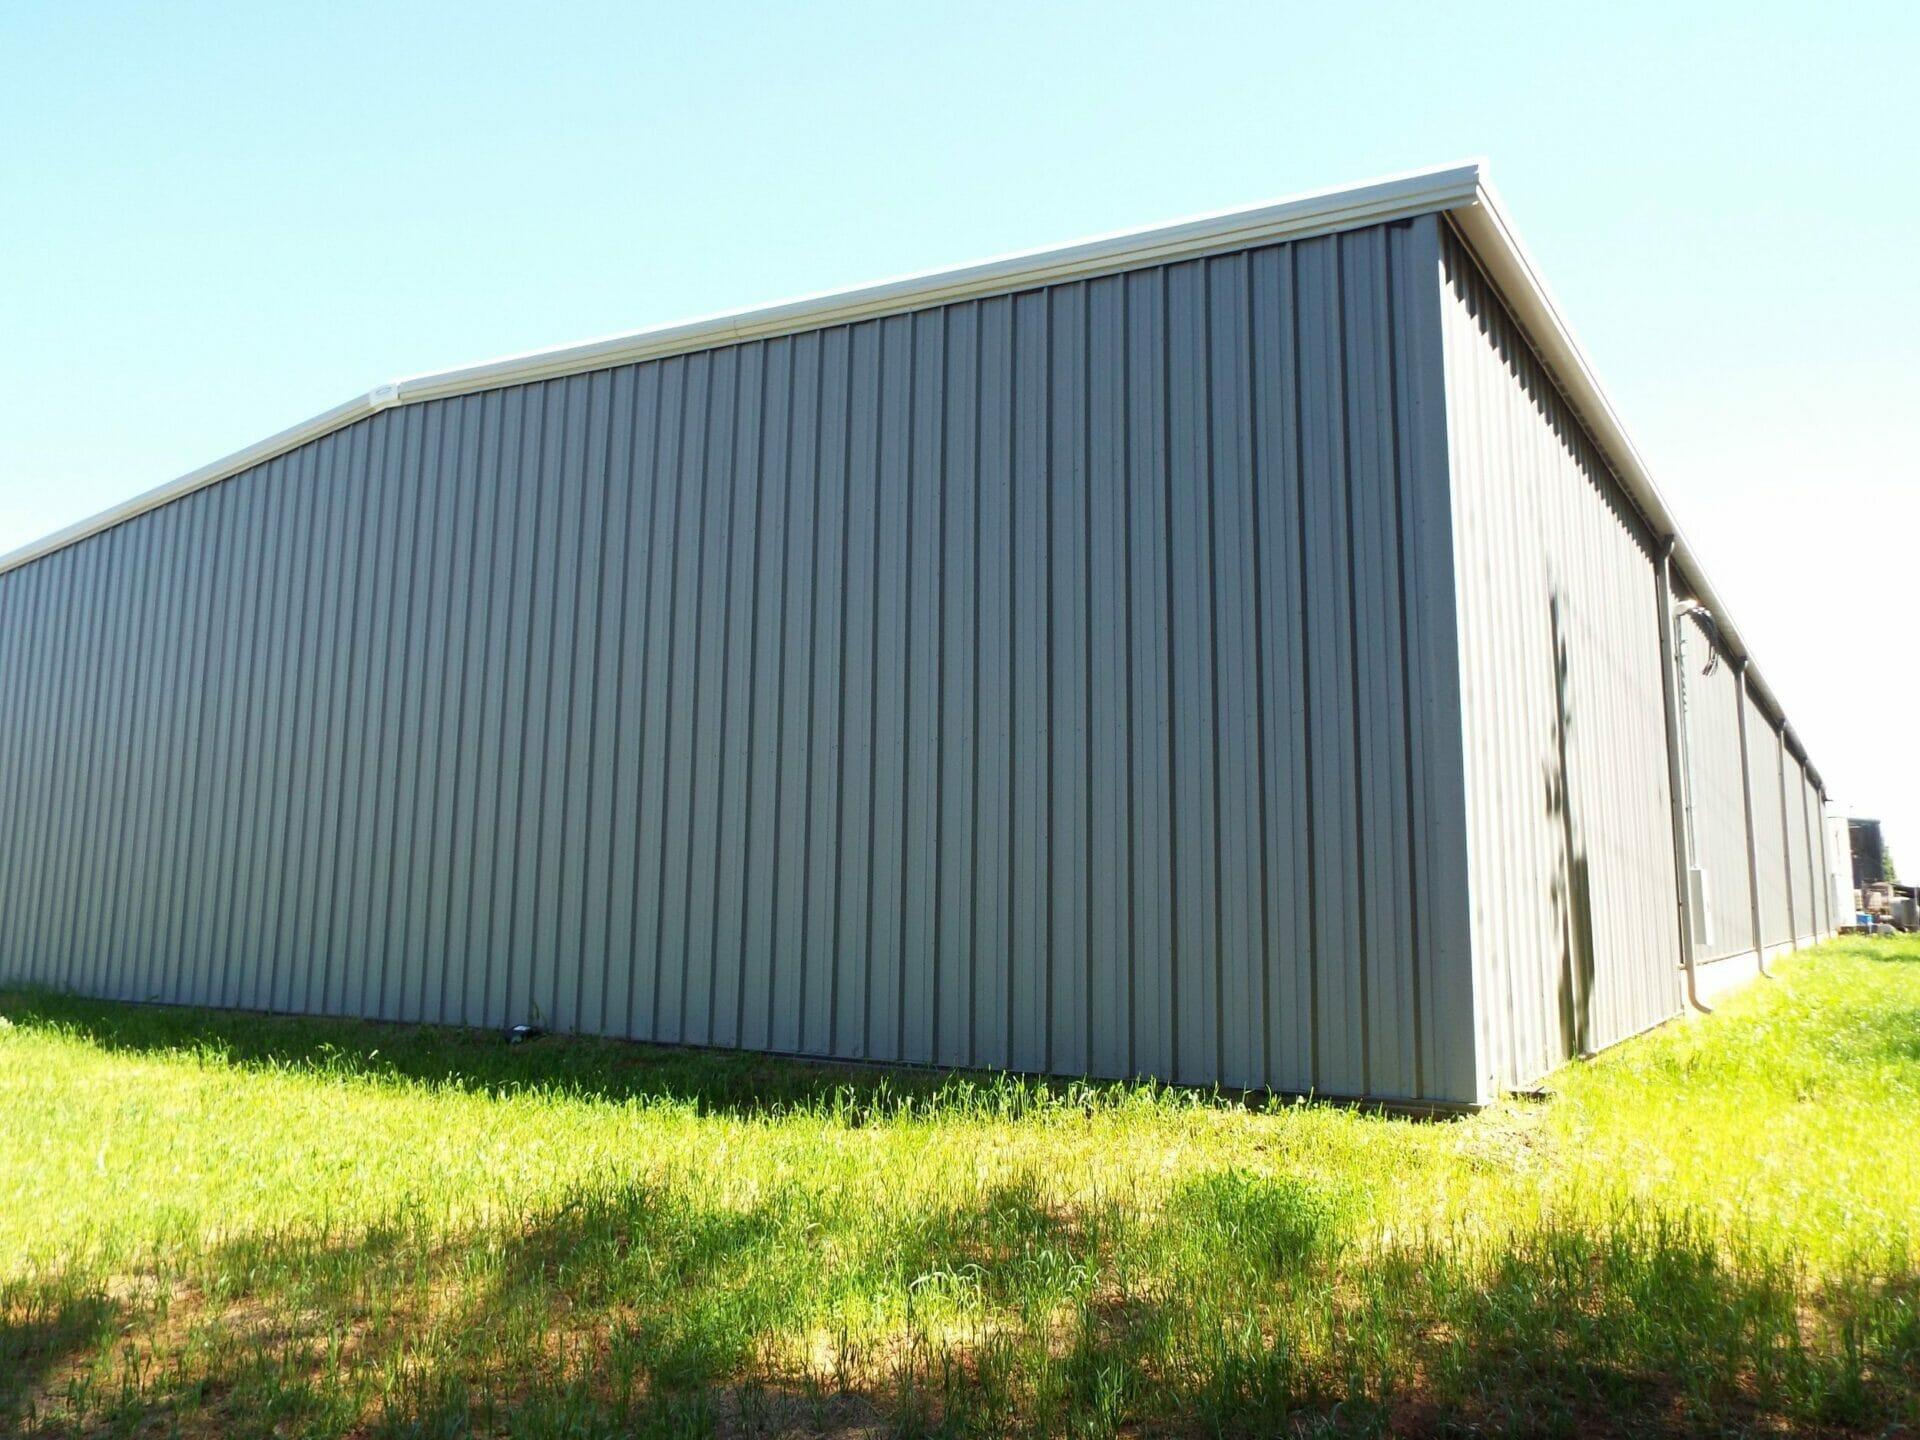 Large Pre-Engineered Steel Building Rear View